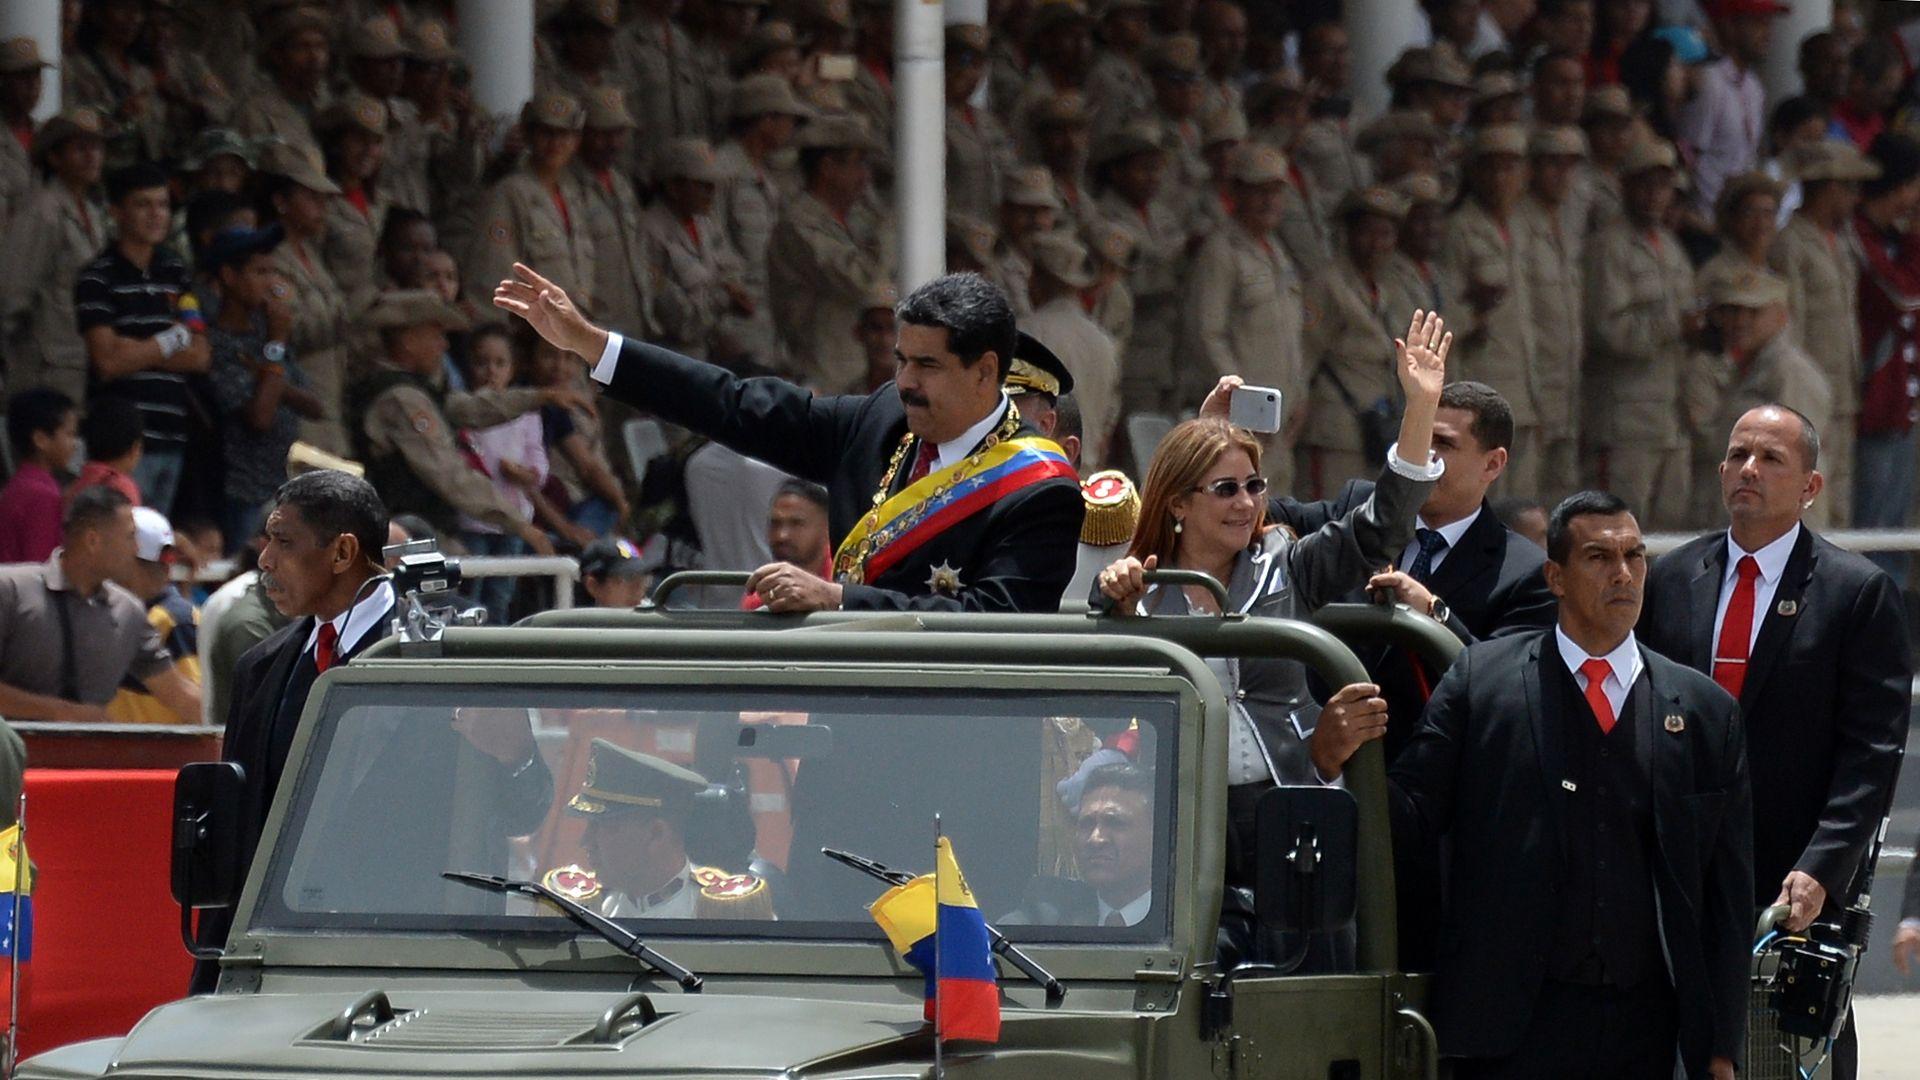 Maduro in military vehicle